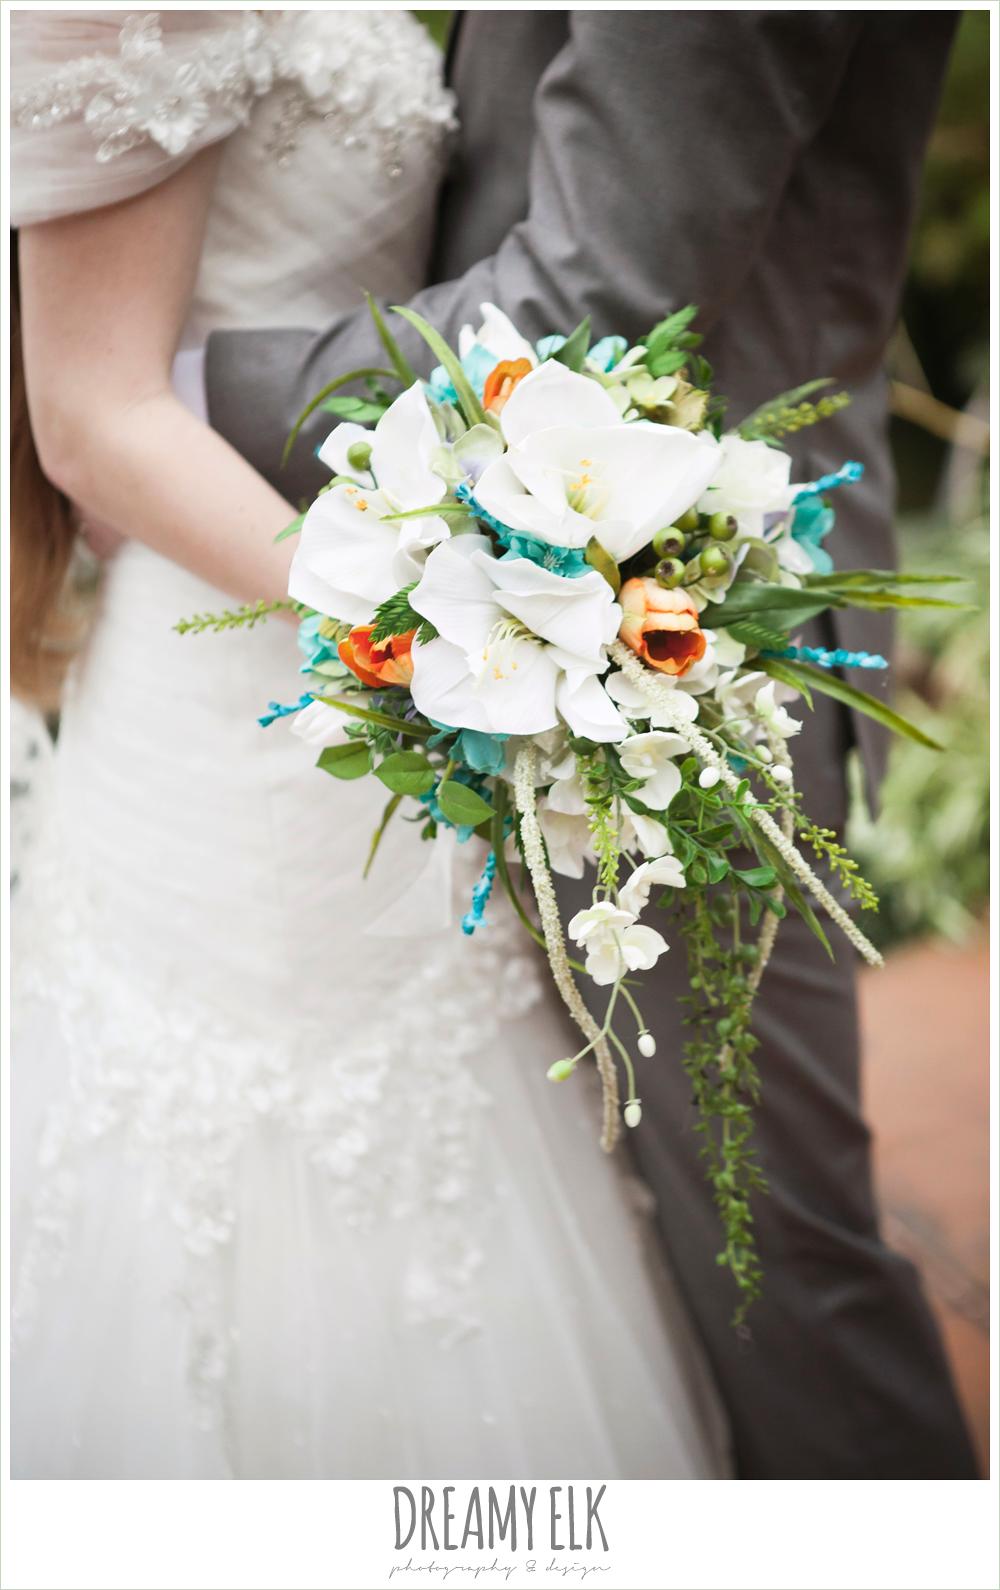 green orange and green wedding bouquet, groom in gray suit, pool tie, off the shoulder mermaid wedding dress, le jardin winter wedding {dreamy elk photography and design}